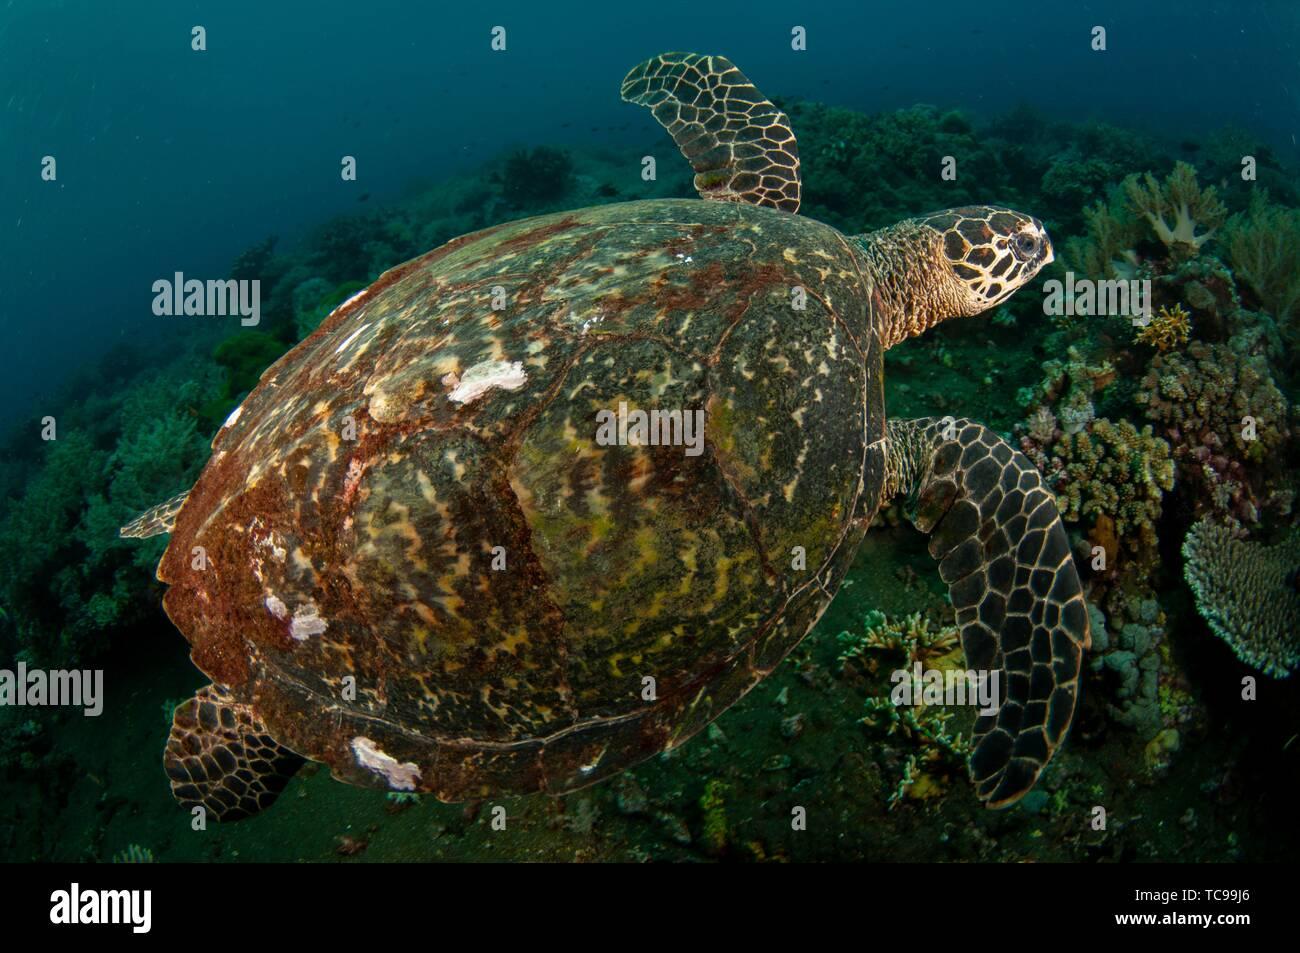 Tartaruga embricata (Eretmochelys imbricata) nuoto, Tanjung Kelapa sito di immersione, Manuk Isola, Banda Mare, Indonesia. Immagini Stock